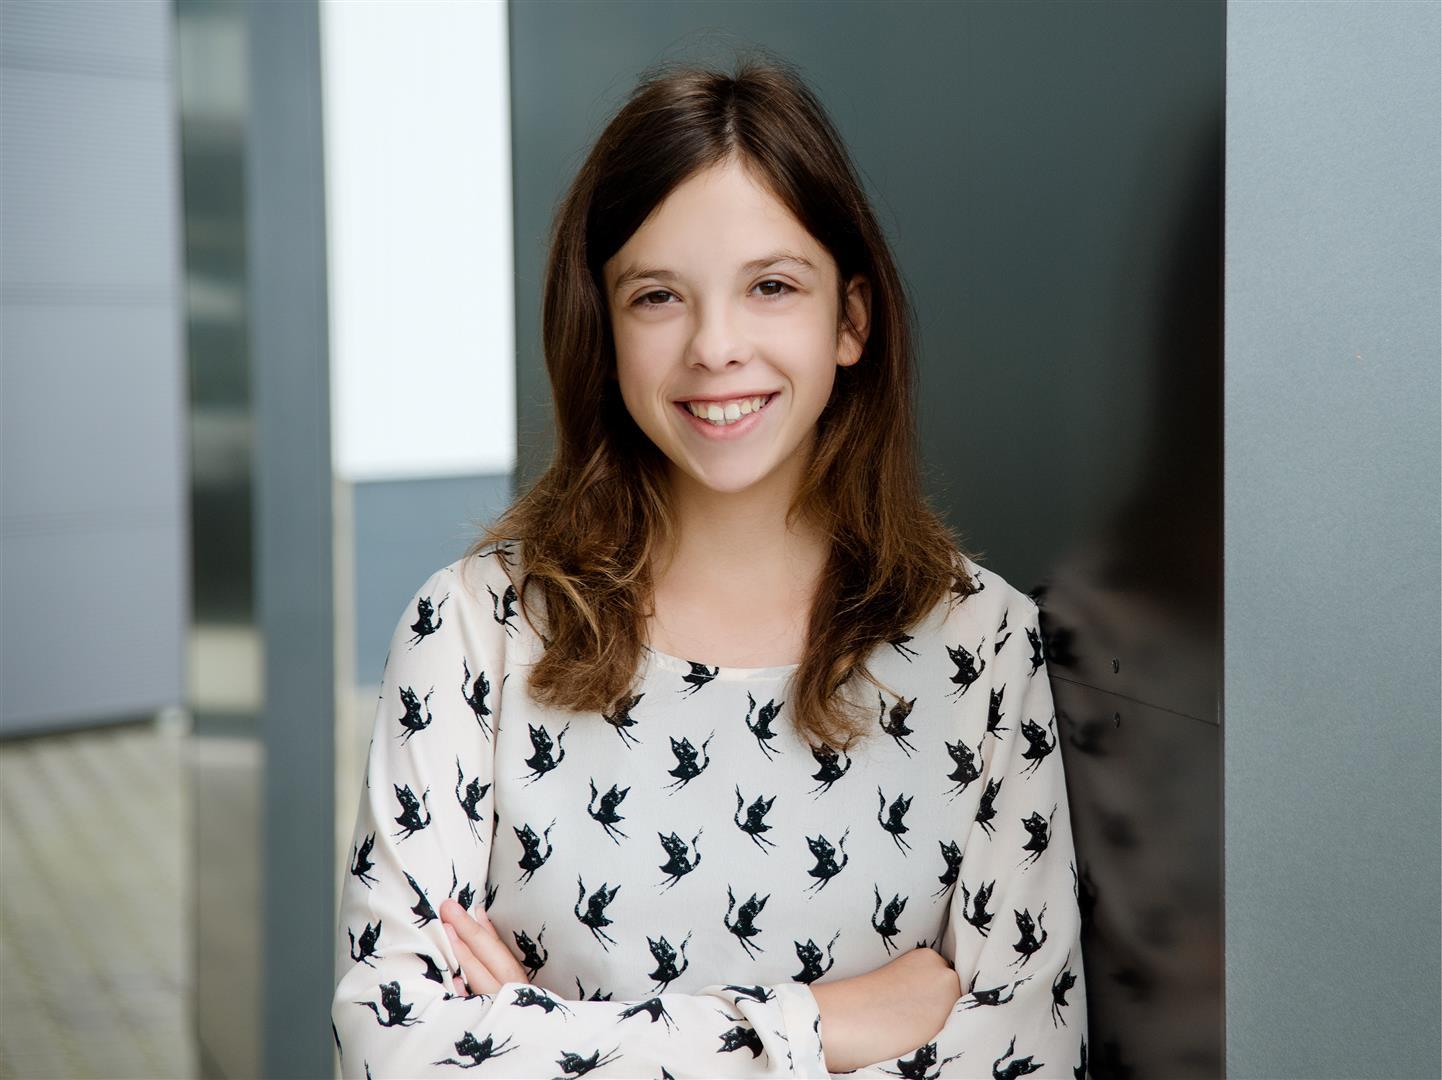 Lucie Gleinig